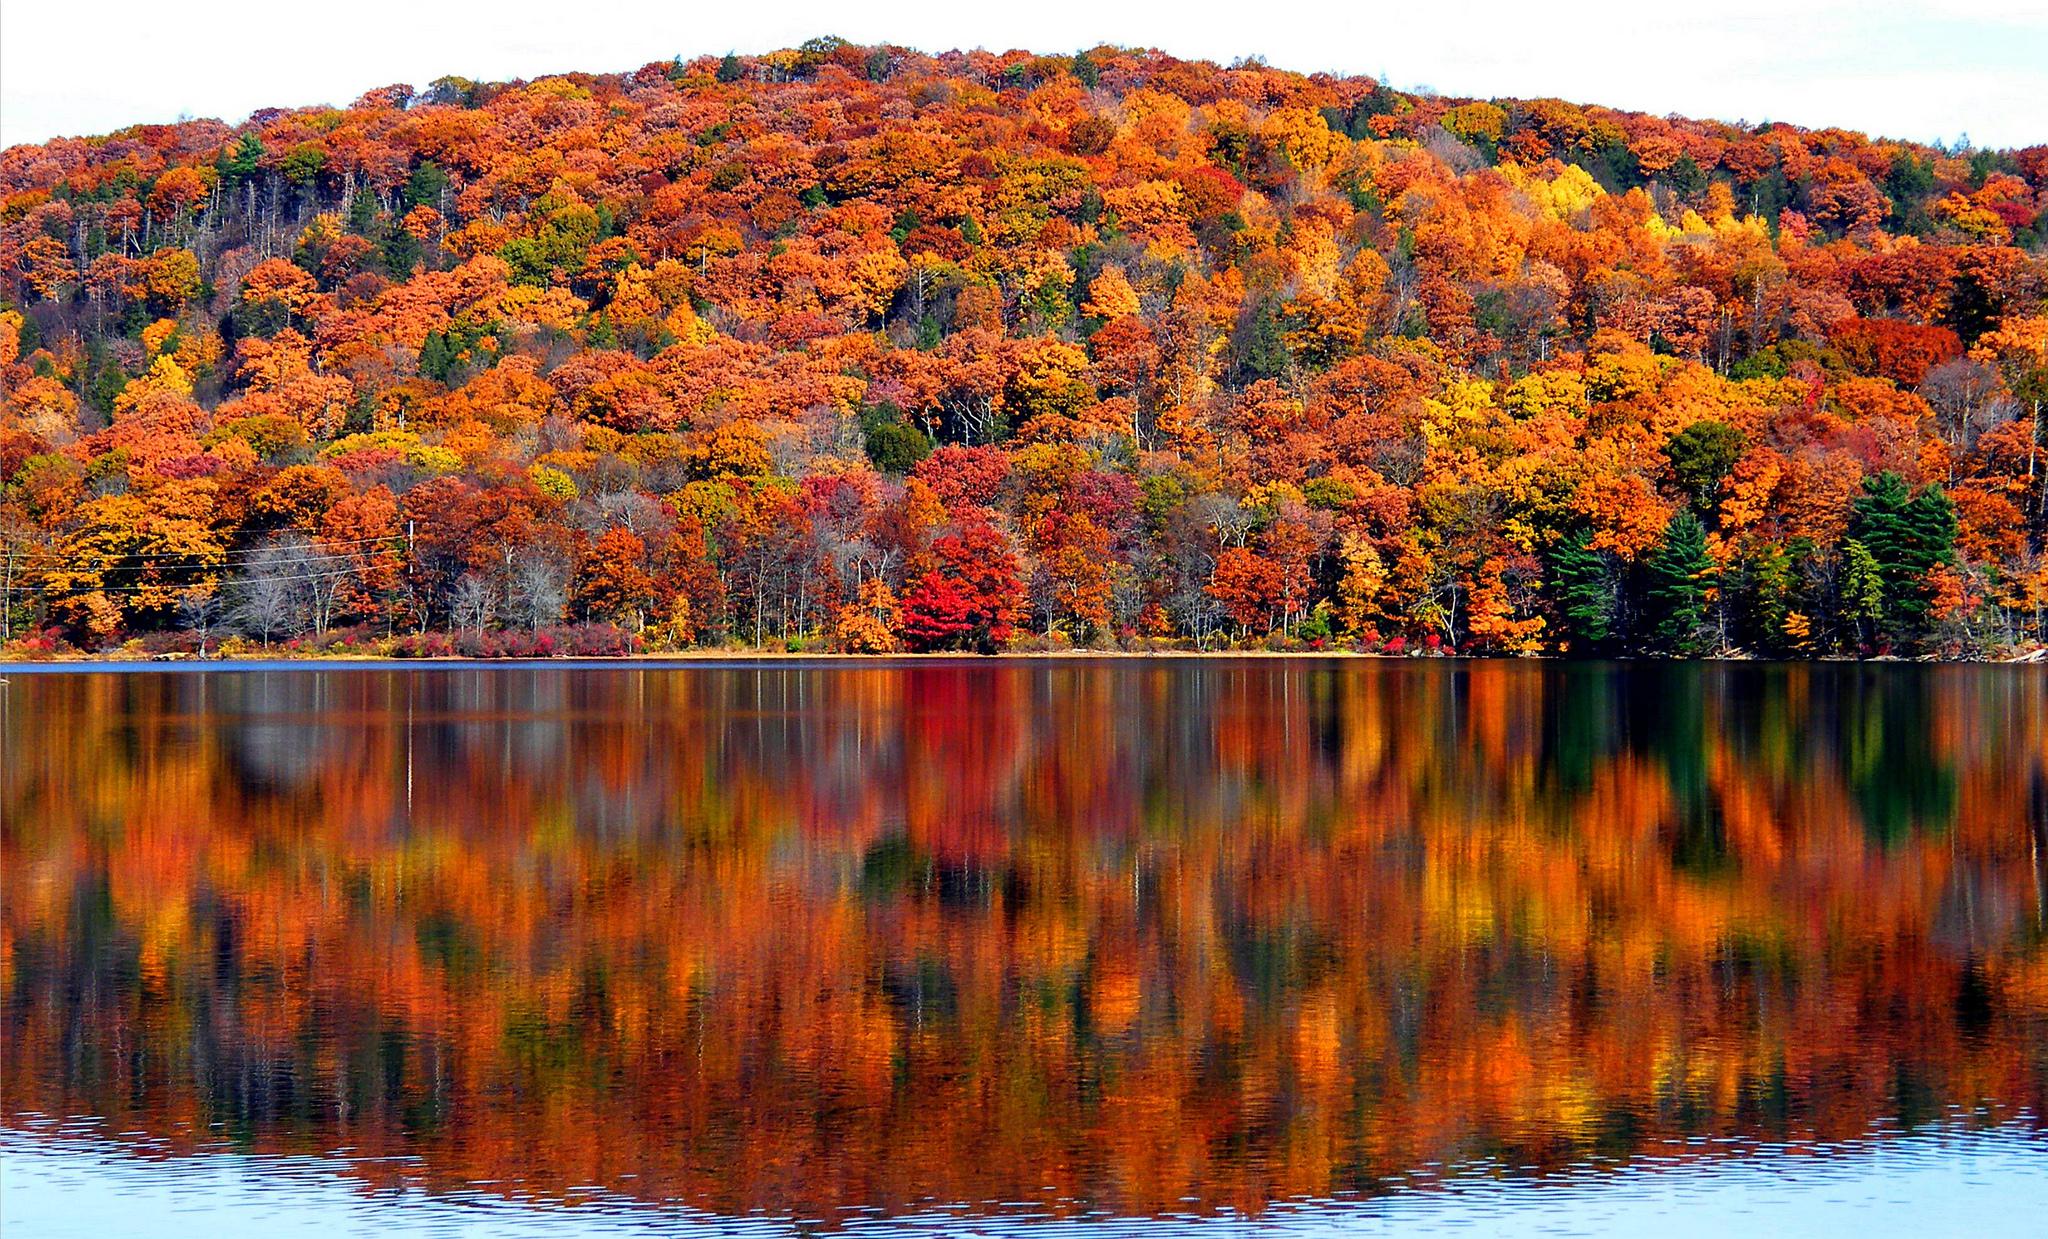 Reminders for Fall - Blog - Saranghae